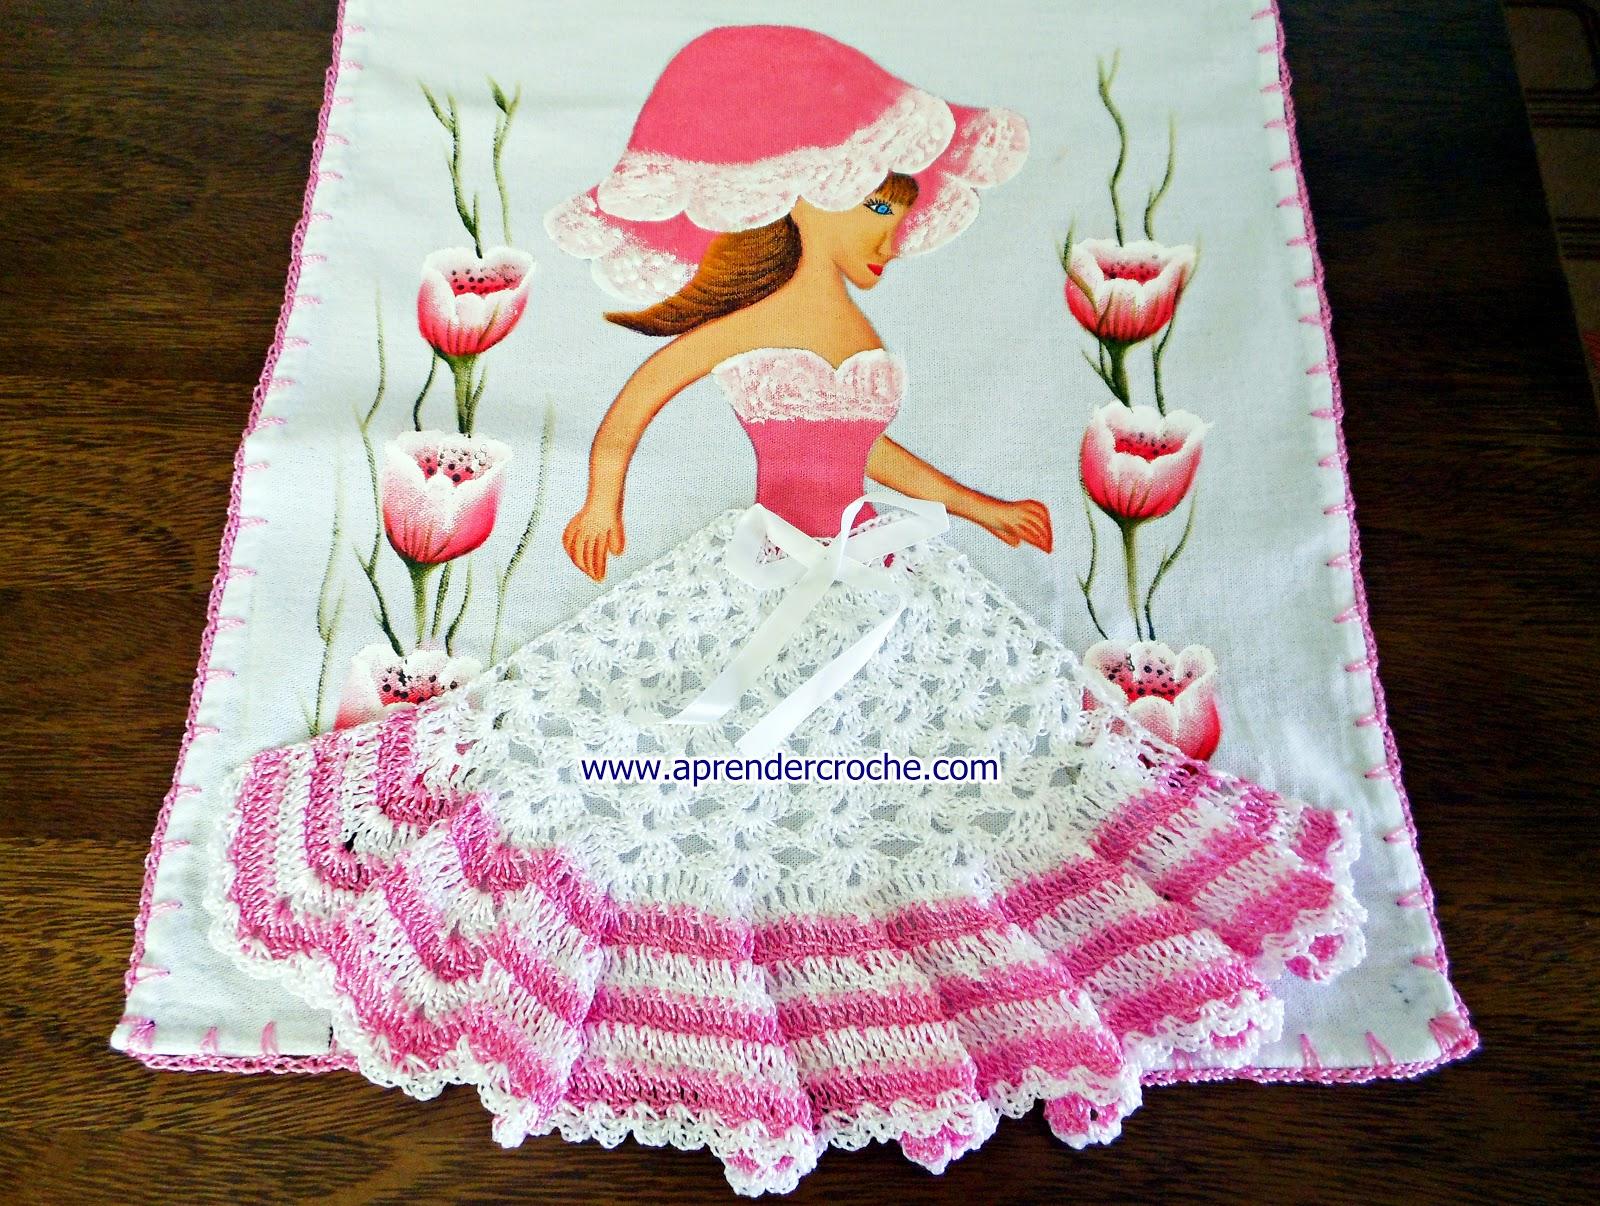 aprender croche com barrados camponesa rosa tulipas